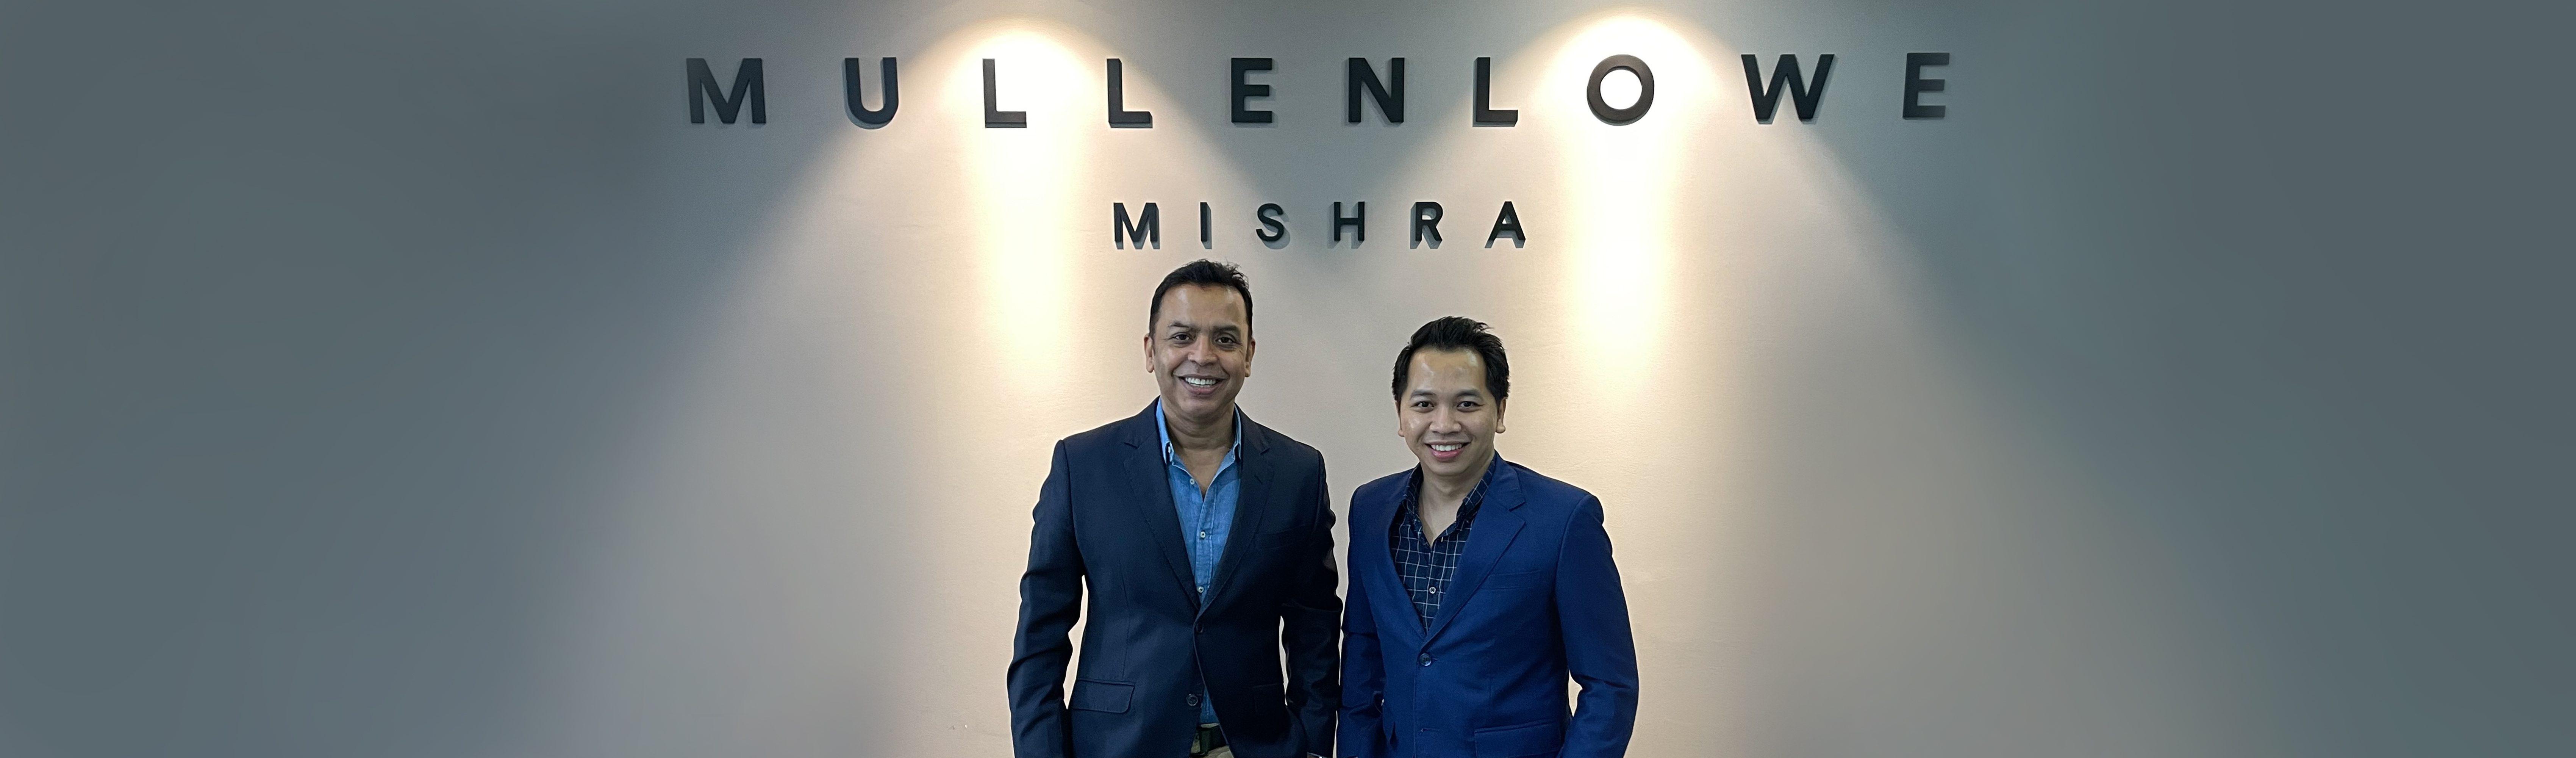 MullenLowe Mishra Names Hung Nguyen as Vietnam Business Director